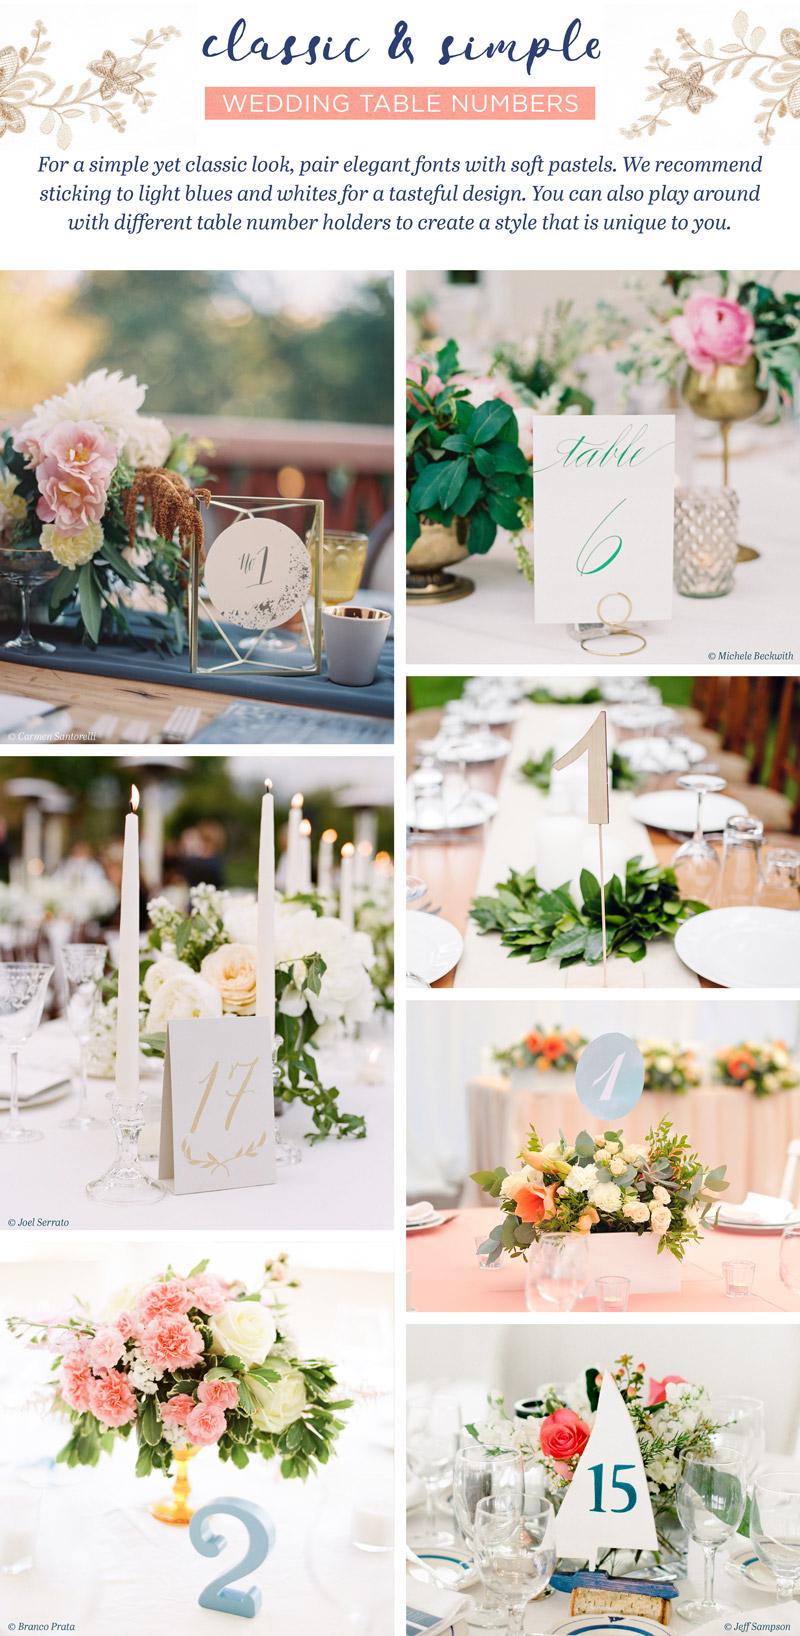 28 Stunning Wedding Table Number Ideas - WeddingMix Blog